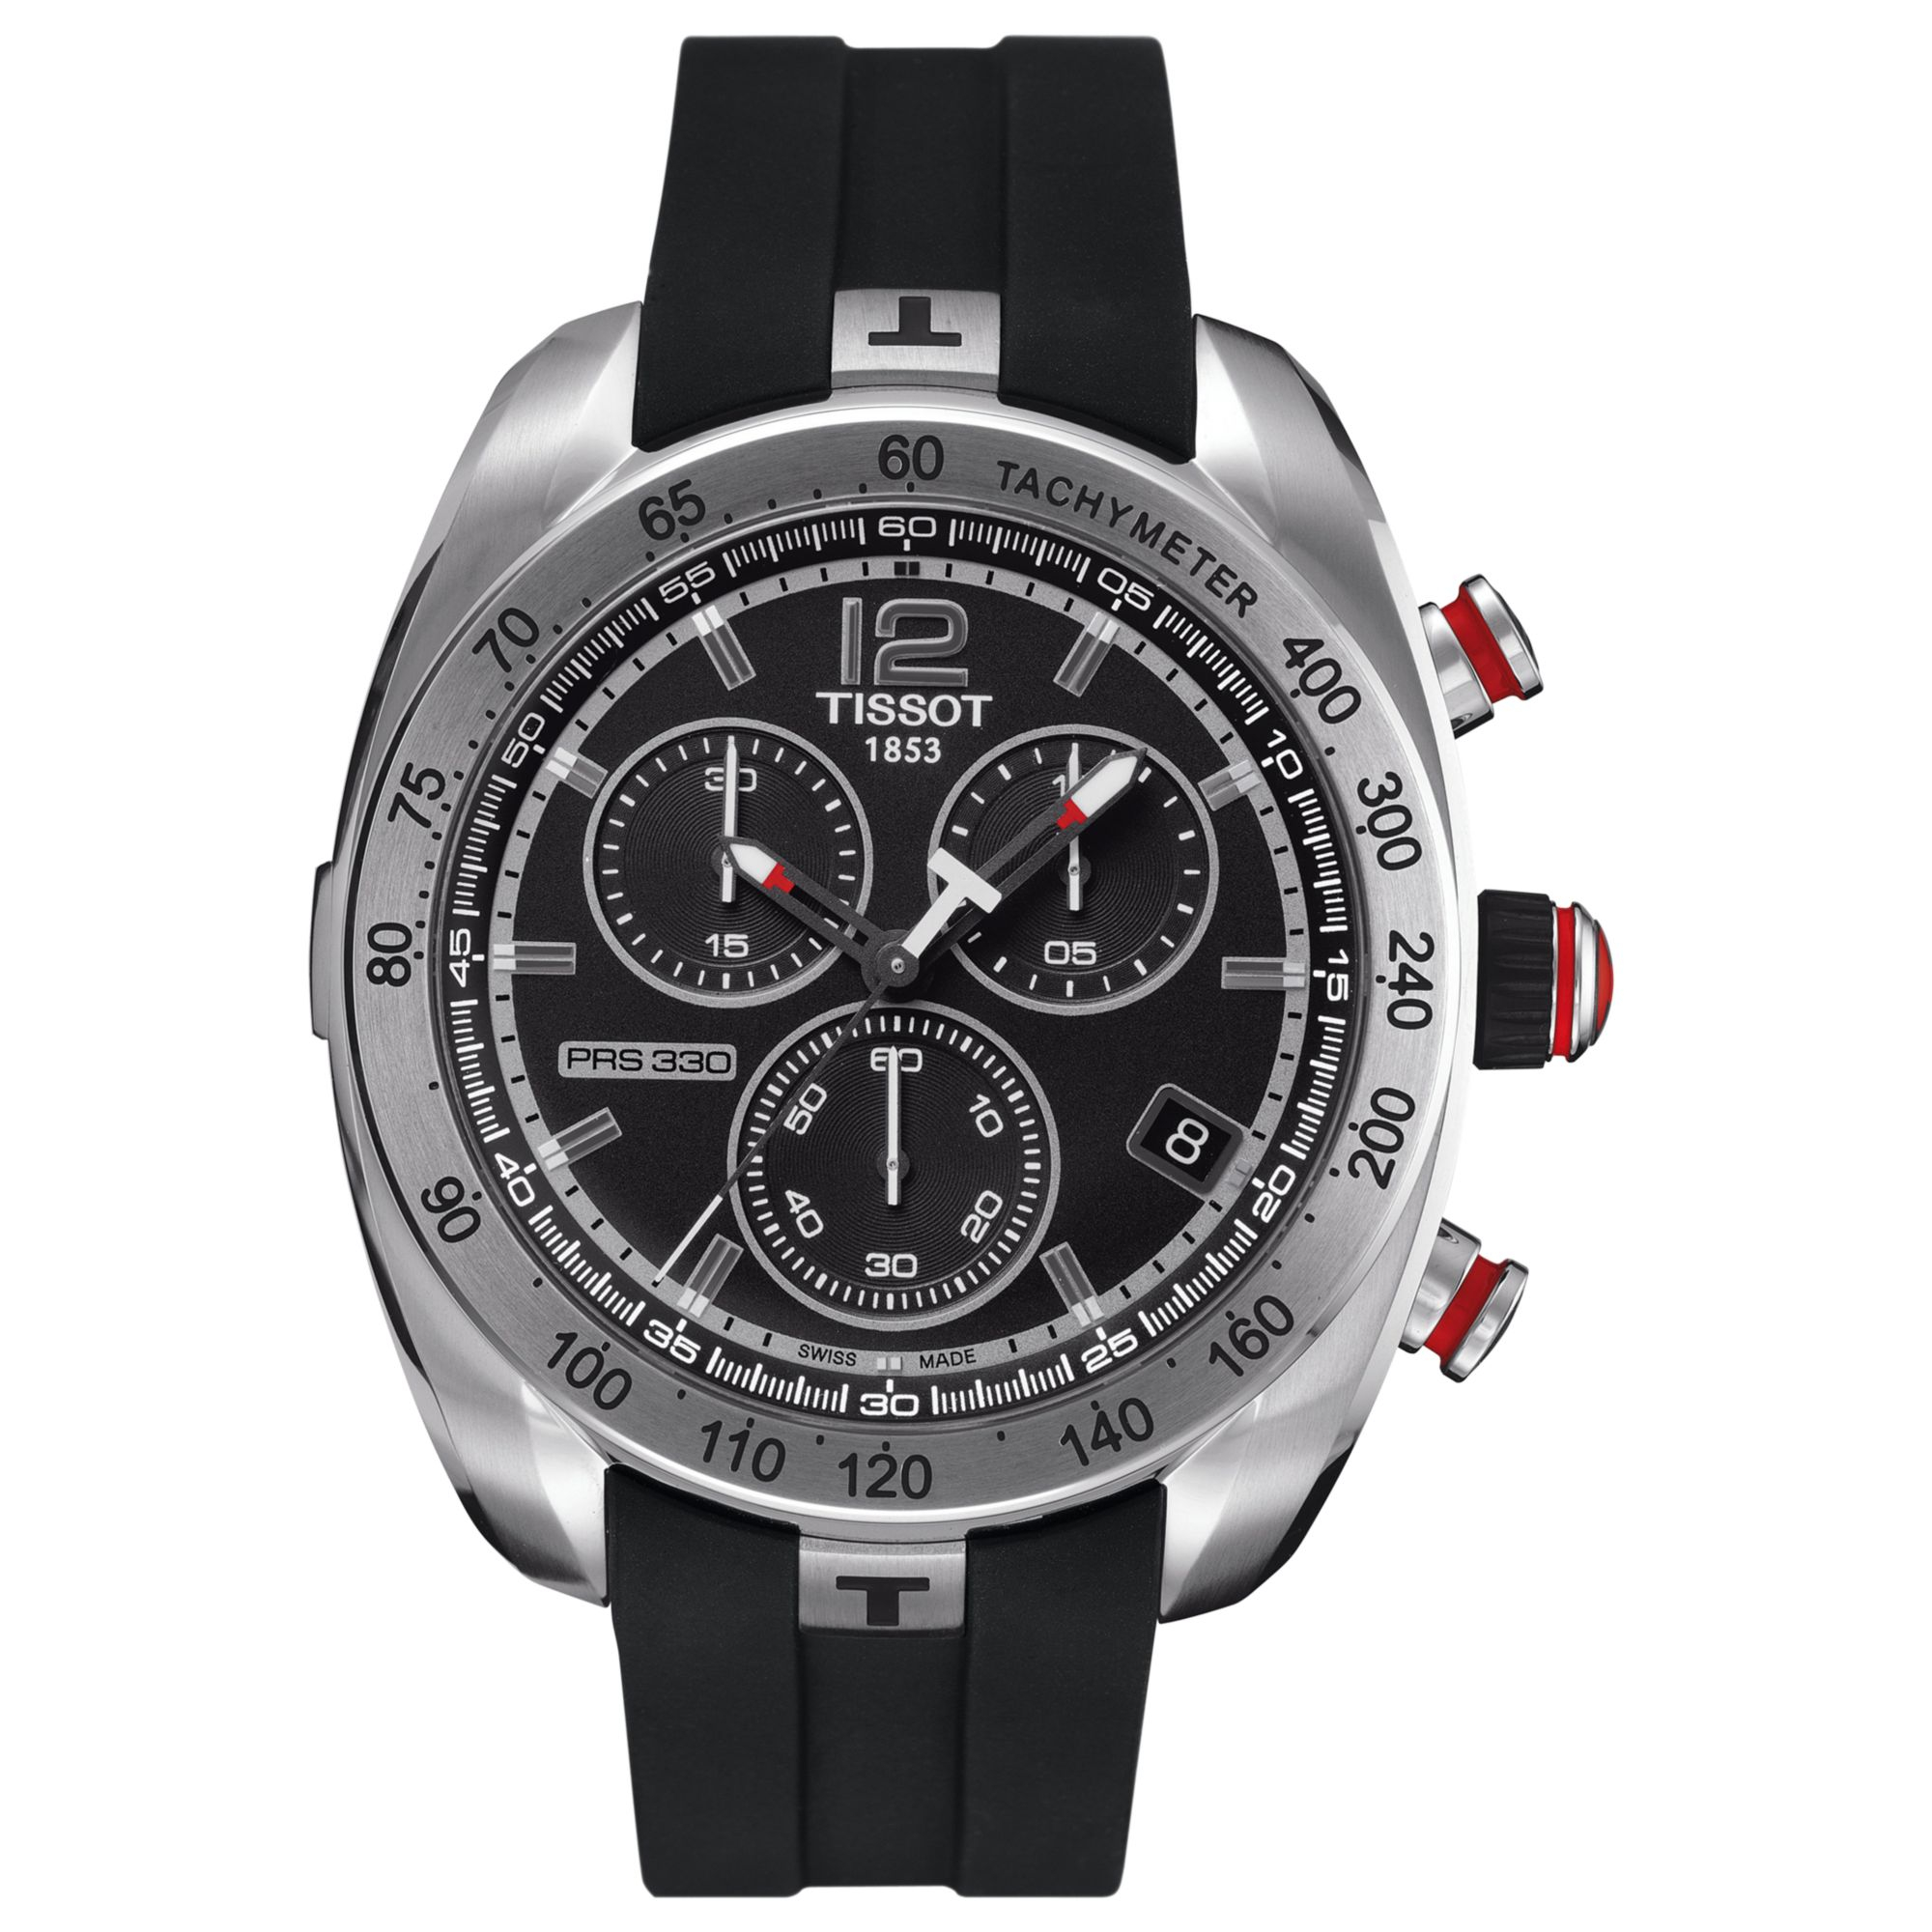 Tissot Mens Swiss Automatic Chronograph Prs330 Black Rubber Strap